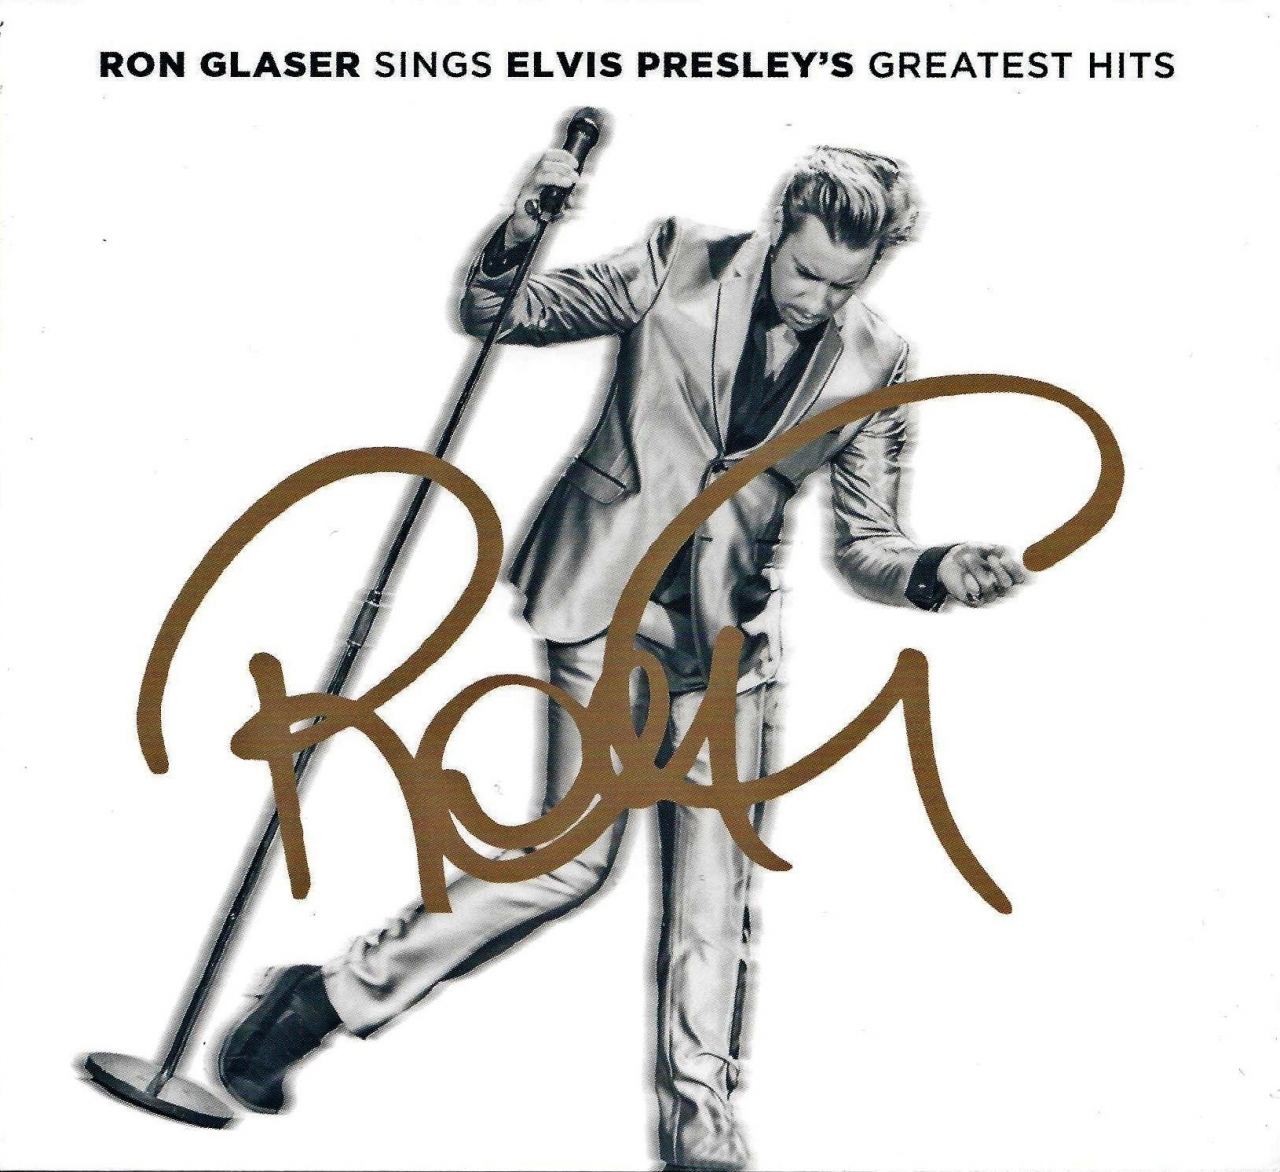 RON GLASER singt Elvis Presses' greatest hits